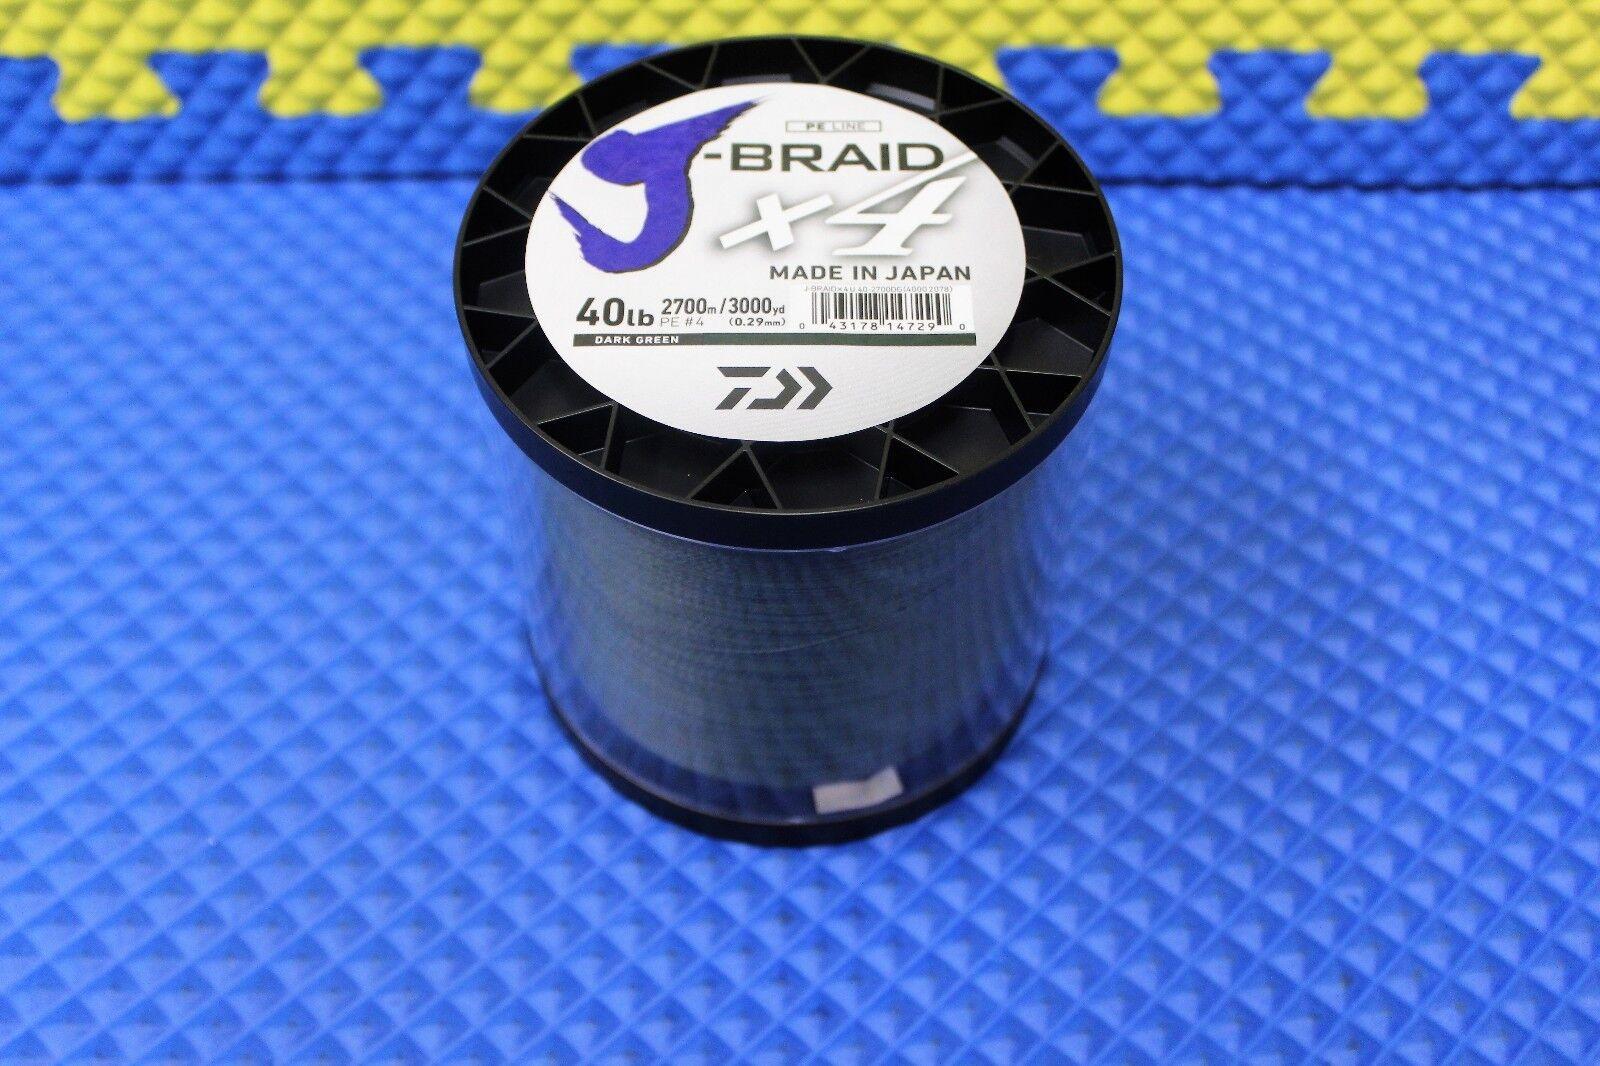 Daiwa J-Braid X4U 40-2700DG Dark vert 40lb 3000yd 4000-2078